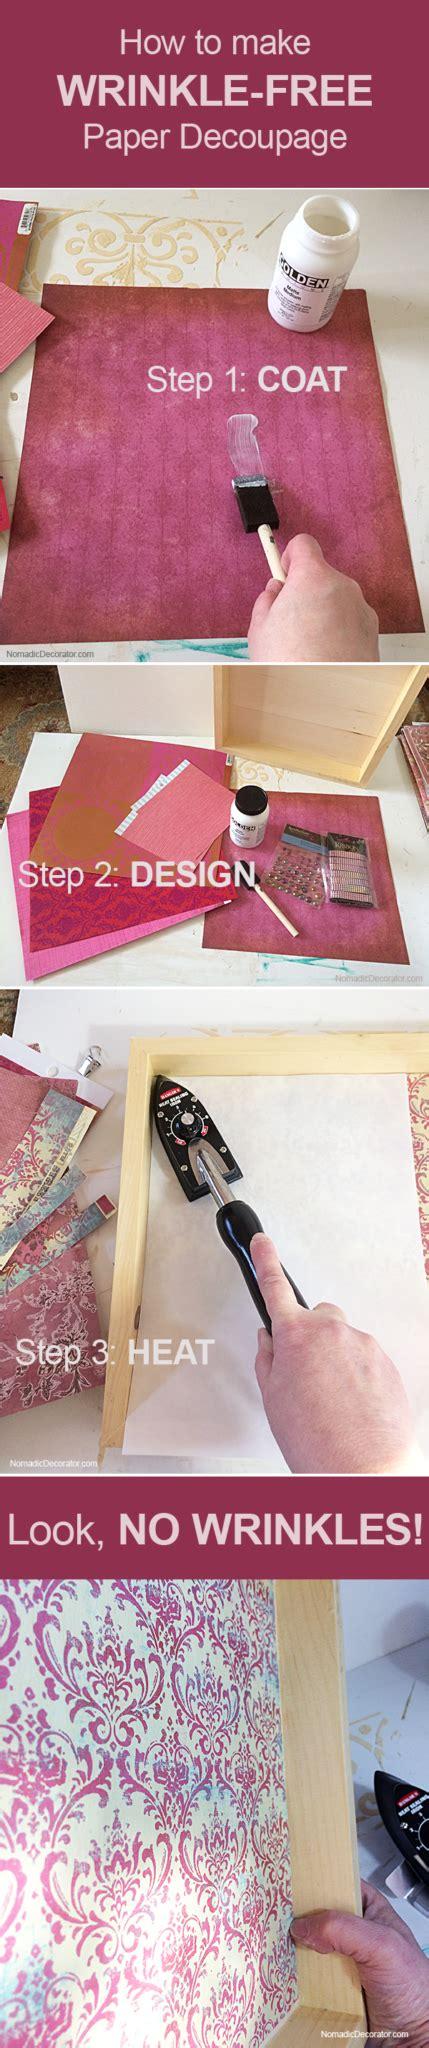 decoupage wrinkles diy tutorial how to make wrinkle free paper decoupage